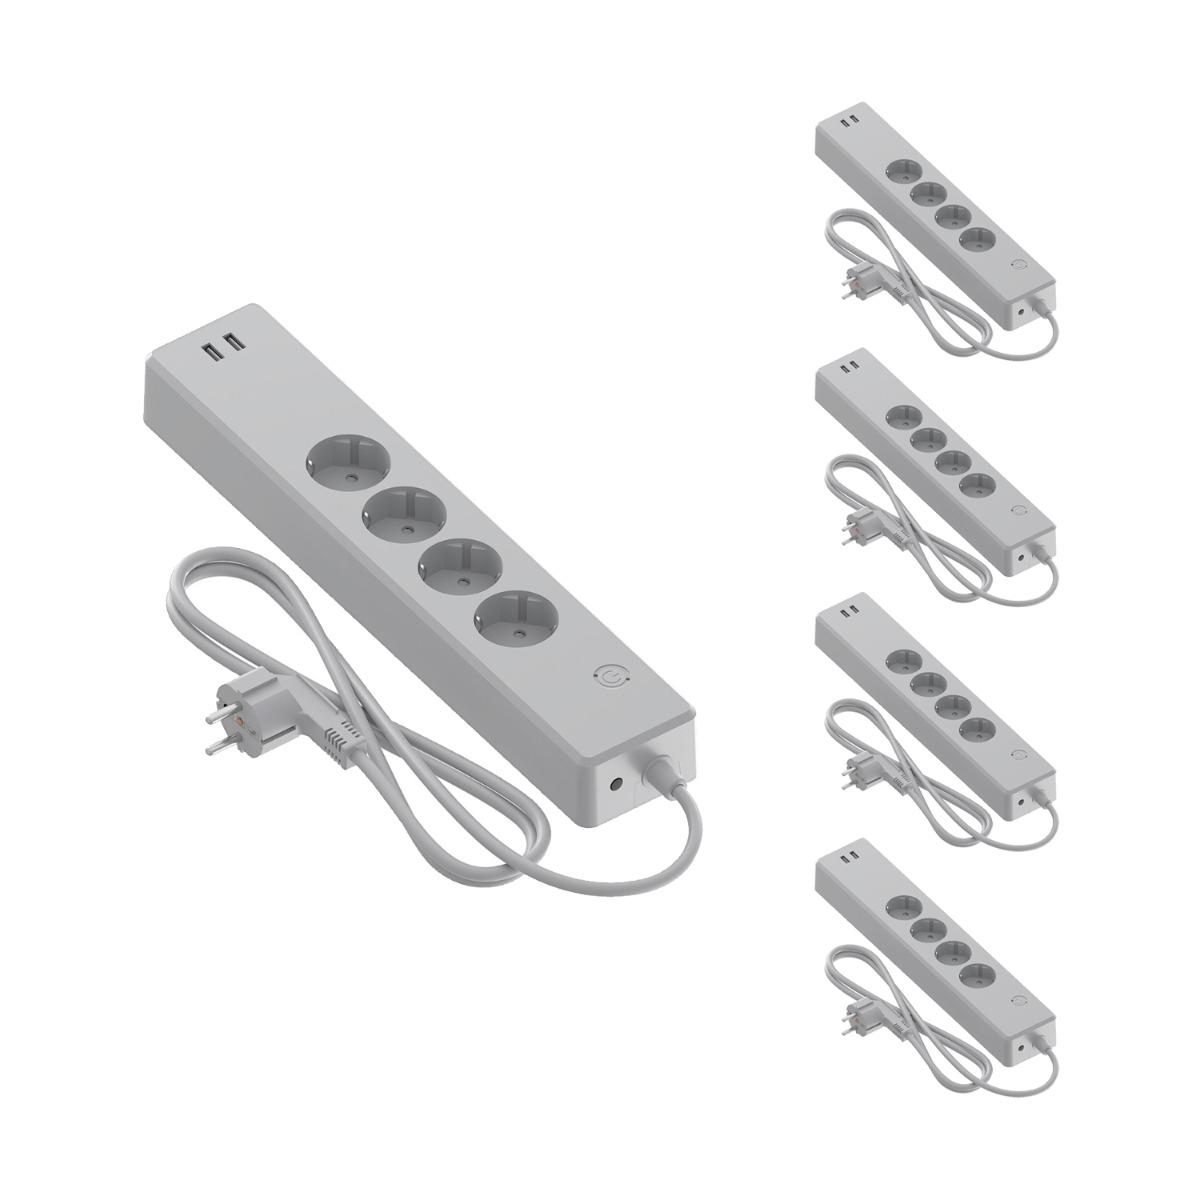 Voordeelpak 5x Calex Smart Stekkerdoos + USB EU | Tuya Wi-Fi